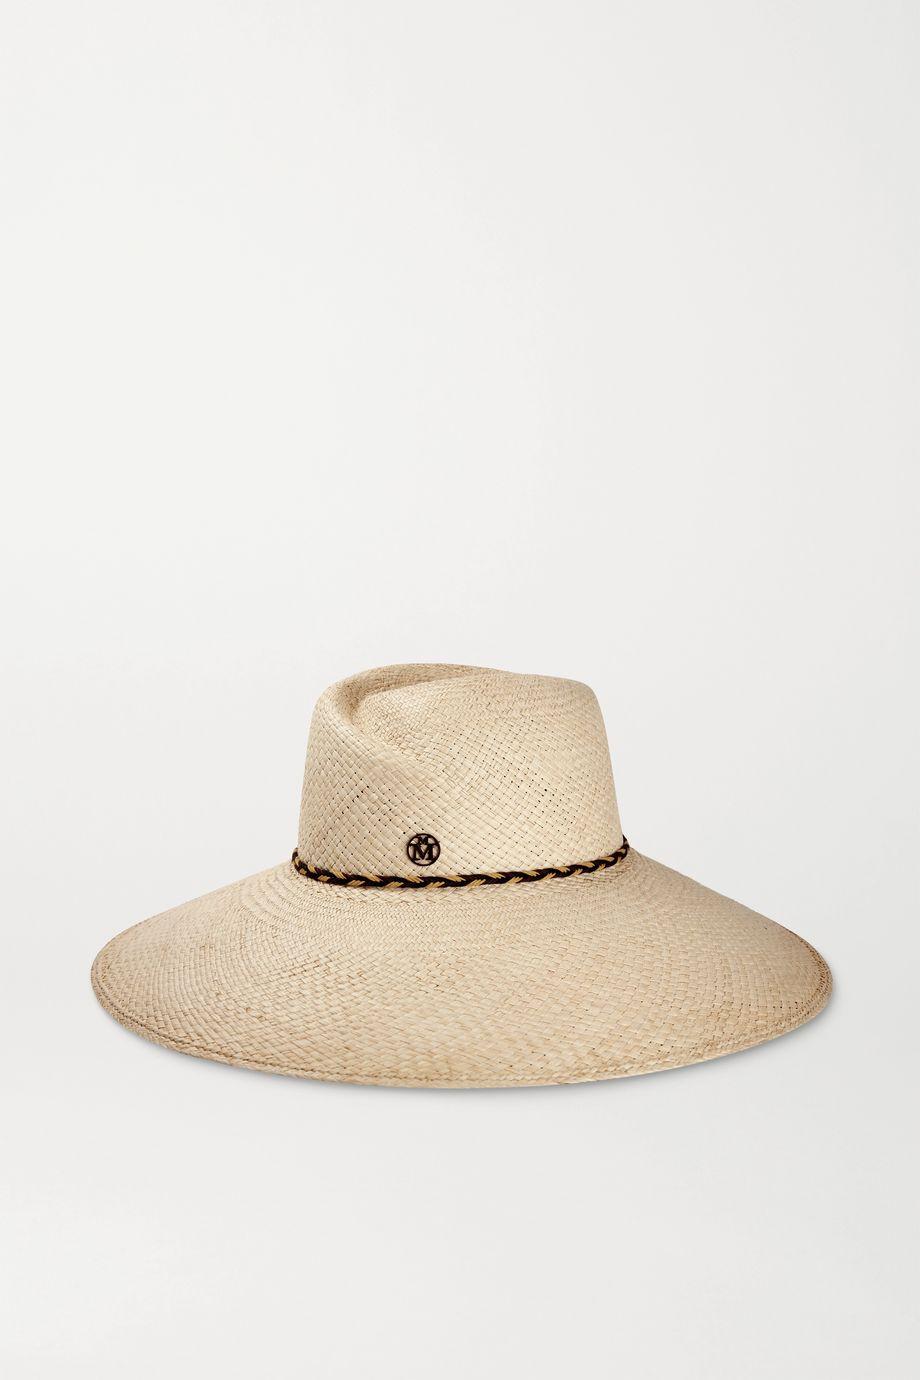 Maison Michel Big Virginie 皮革边饰草帽